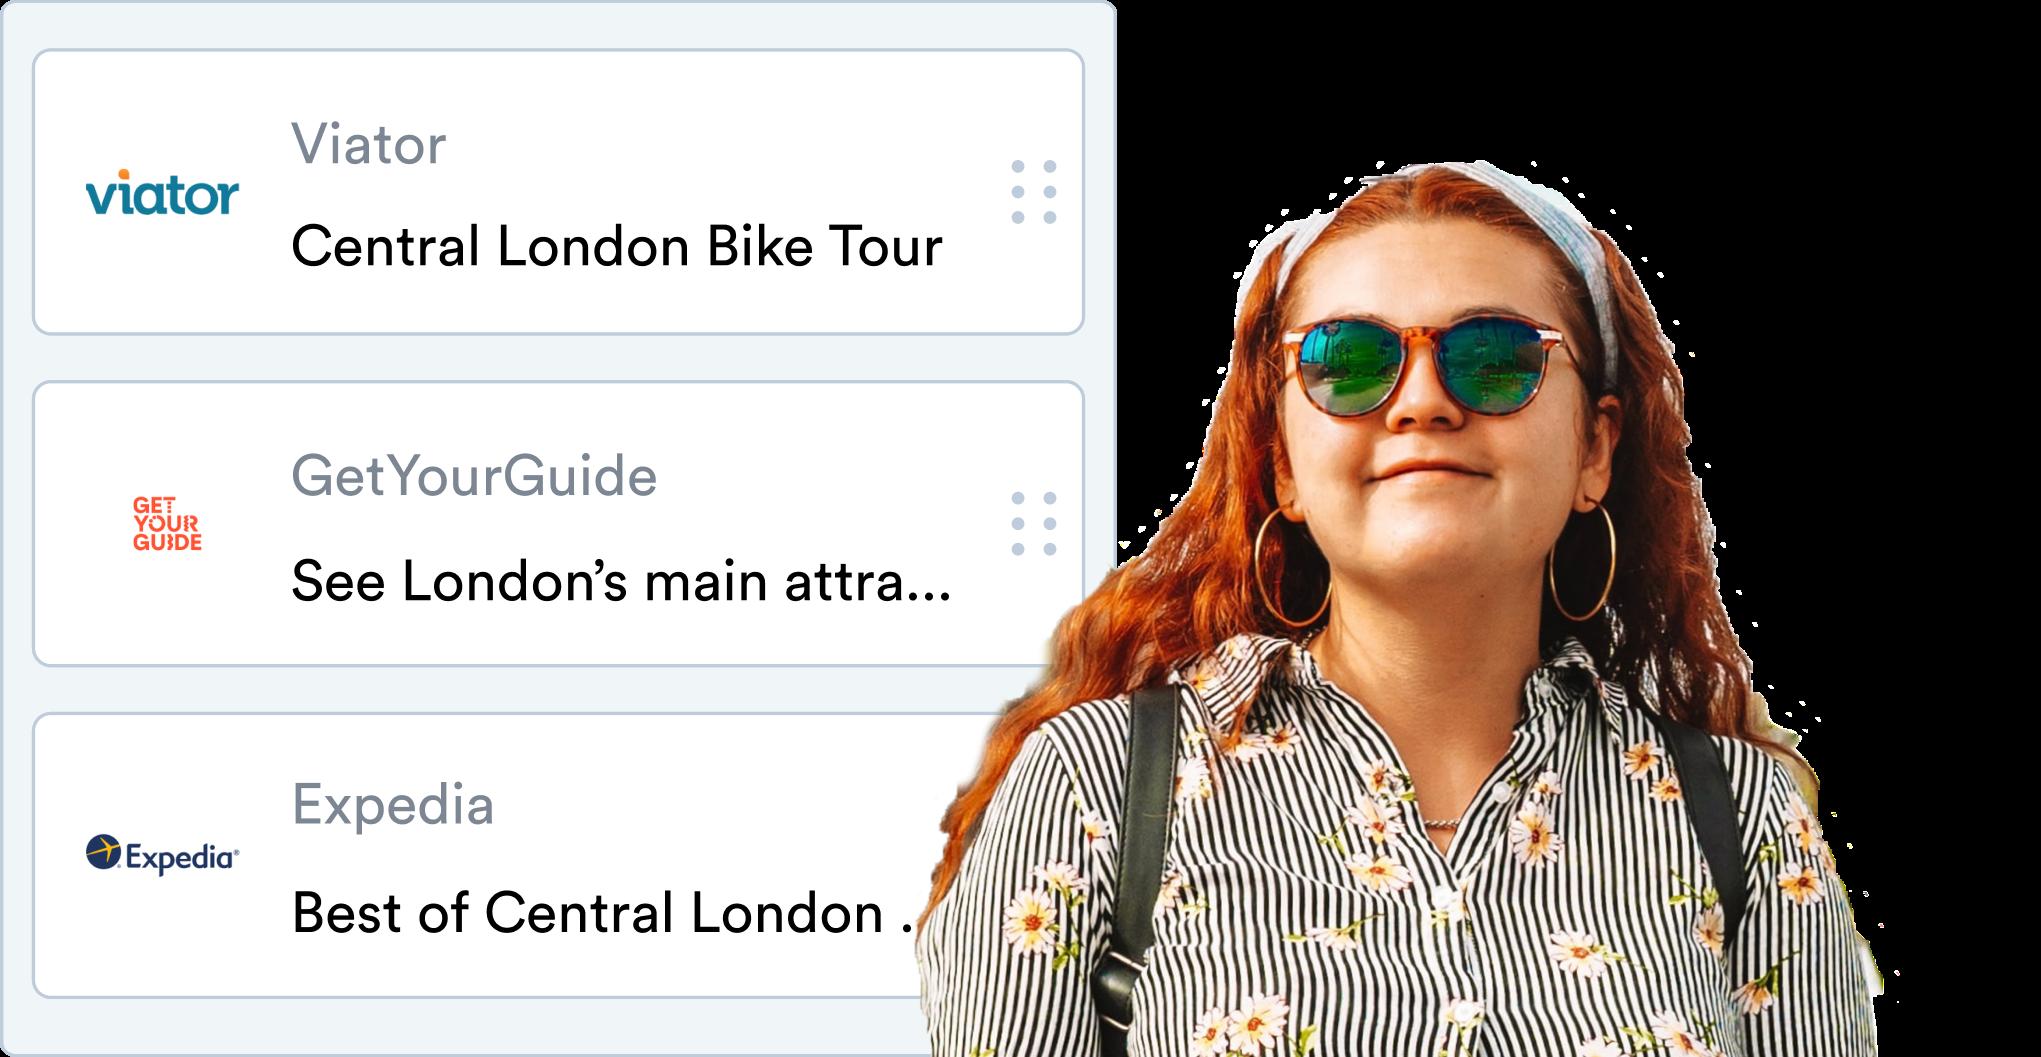 Happy girl with sunglasses overlayed on product showcase image